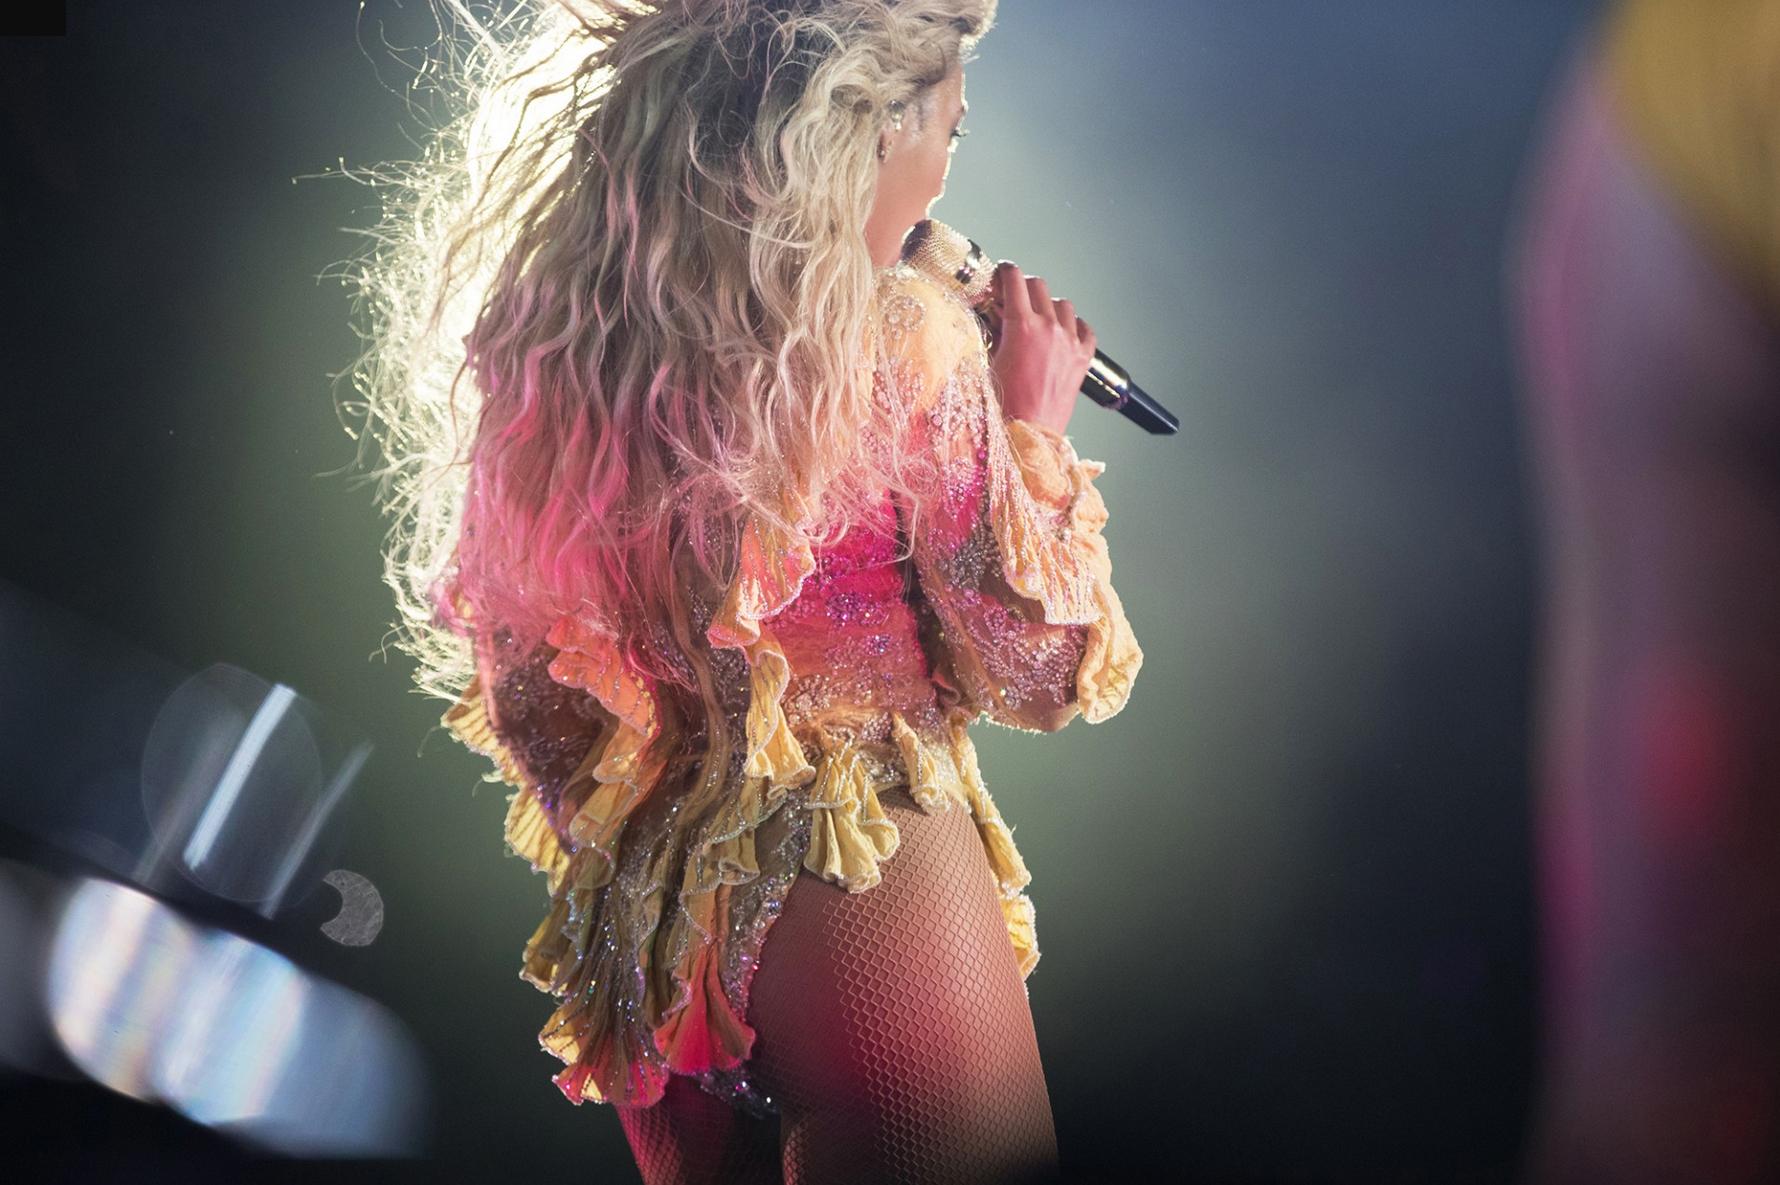 Beyoncé at the Formation World Tour, 2016.